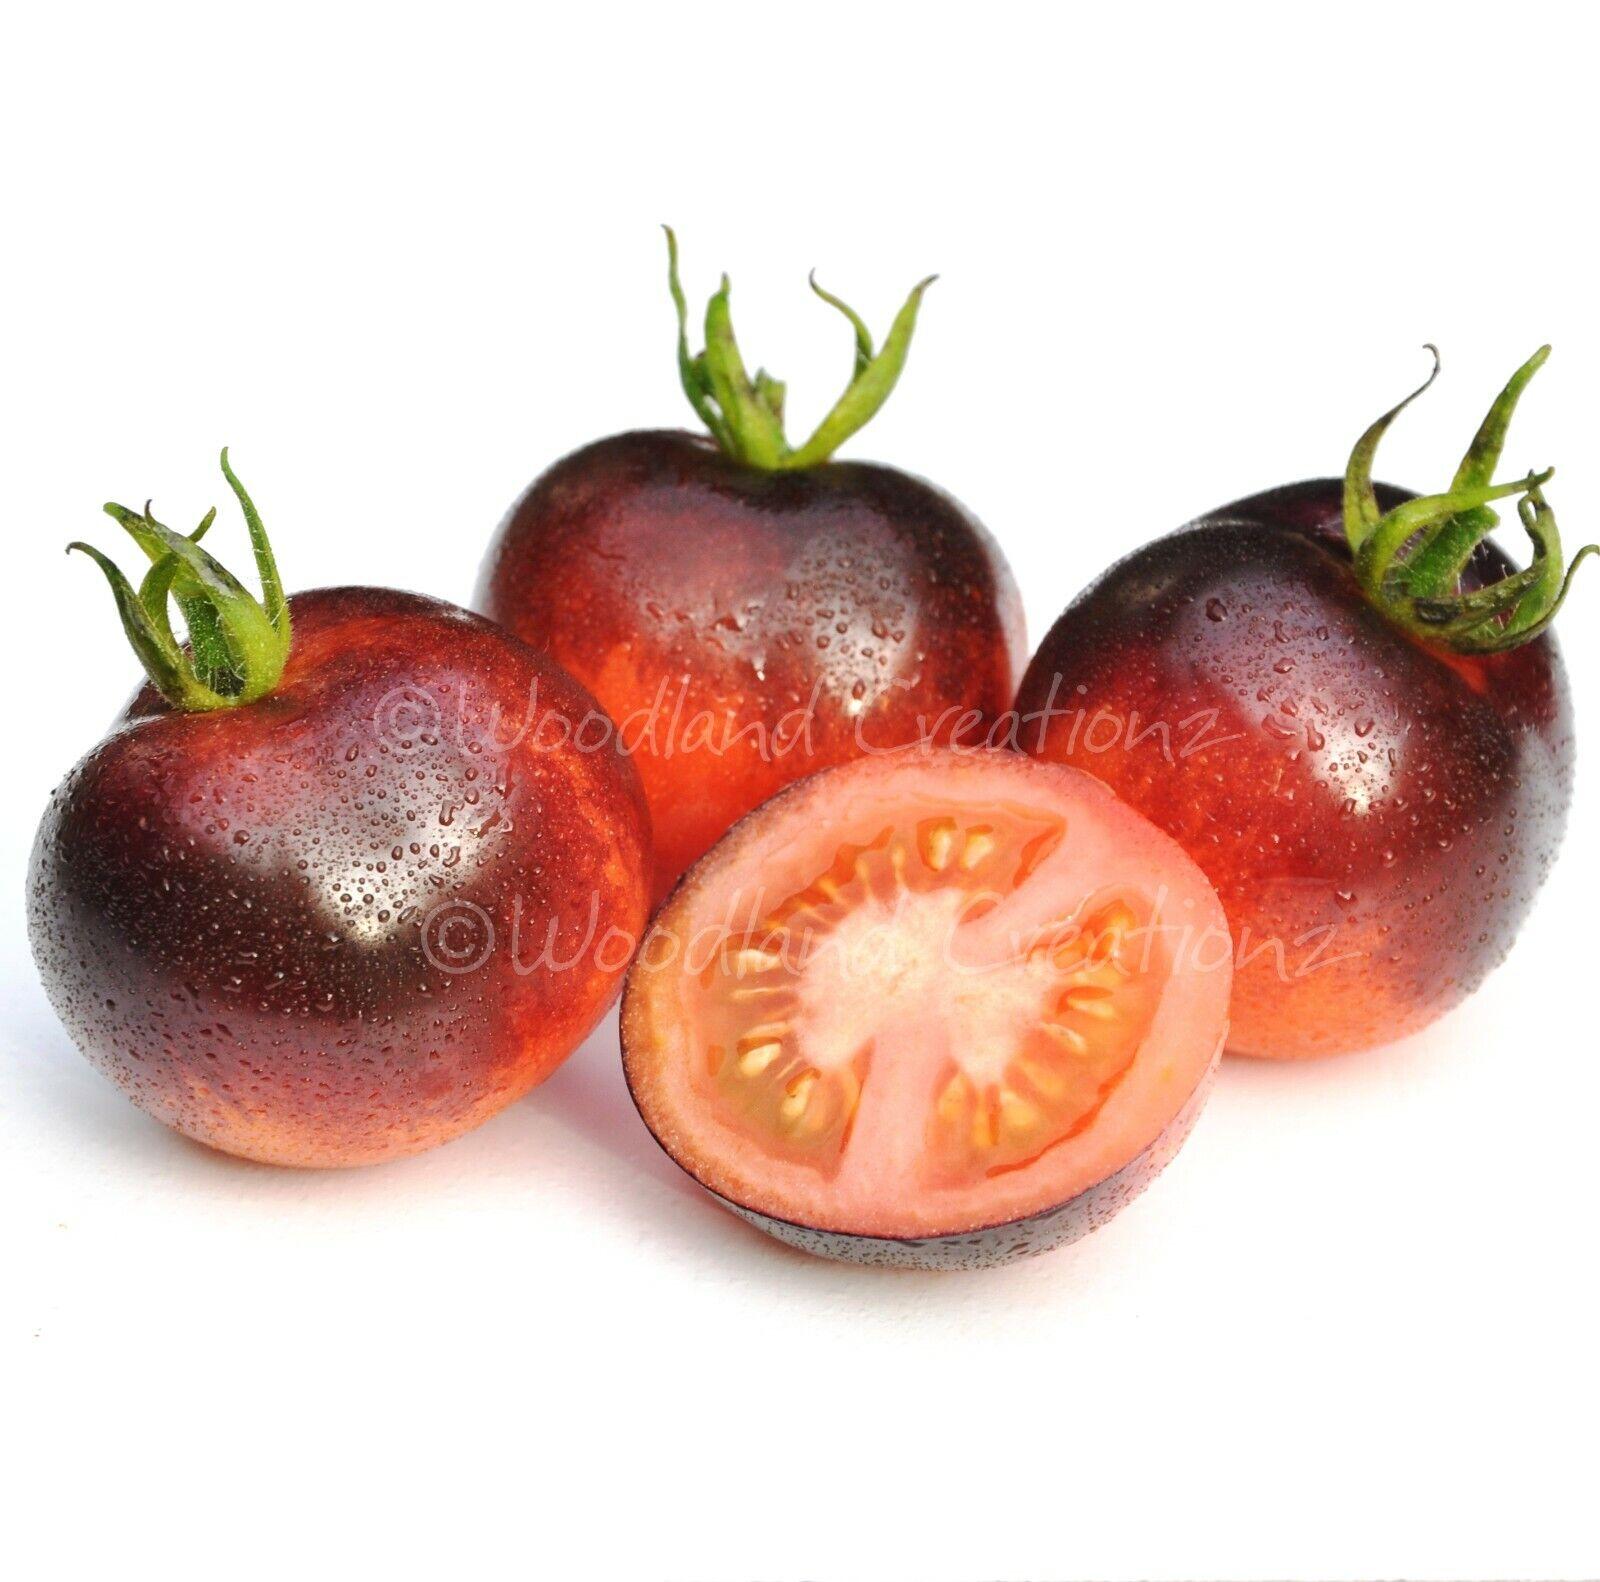 Organically Grown Ukrainian Heirloom Vegetable NON GMO Purple Tomato Seeds